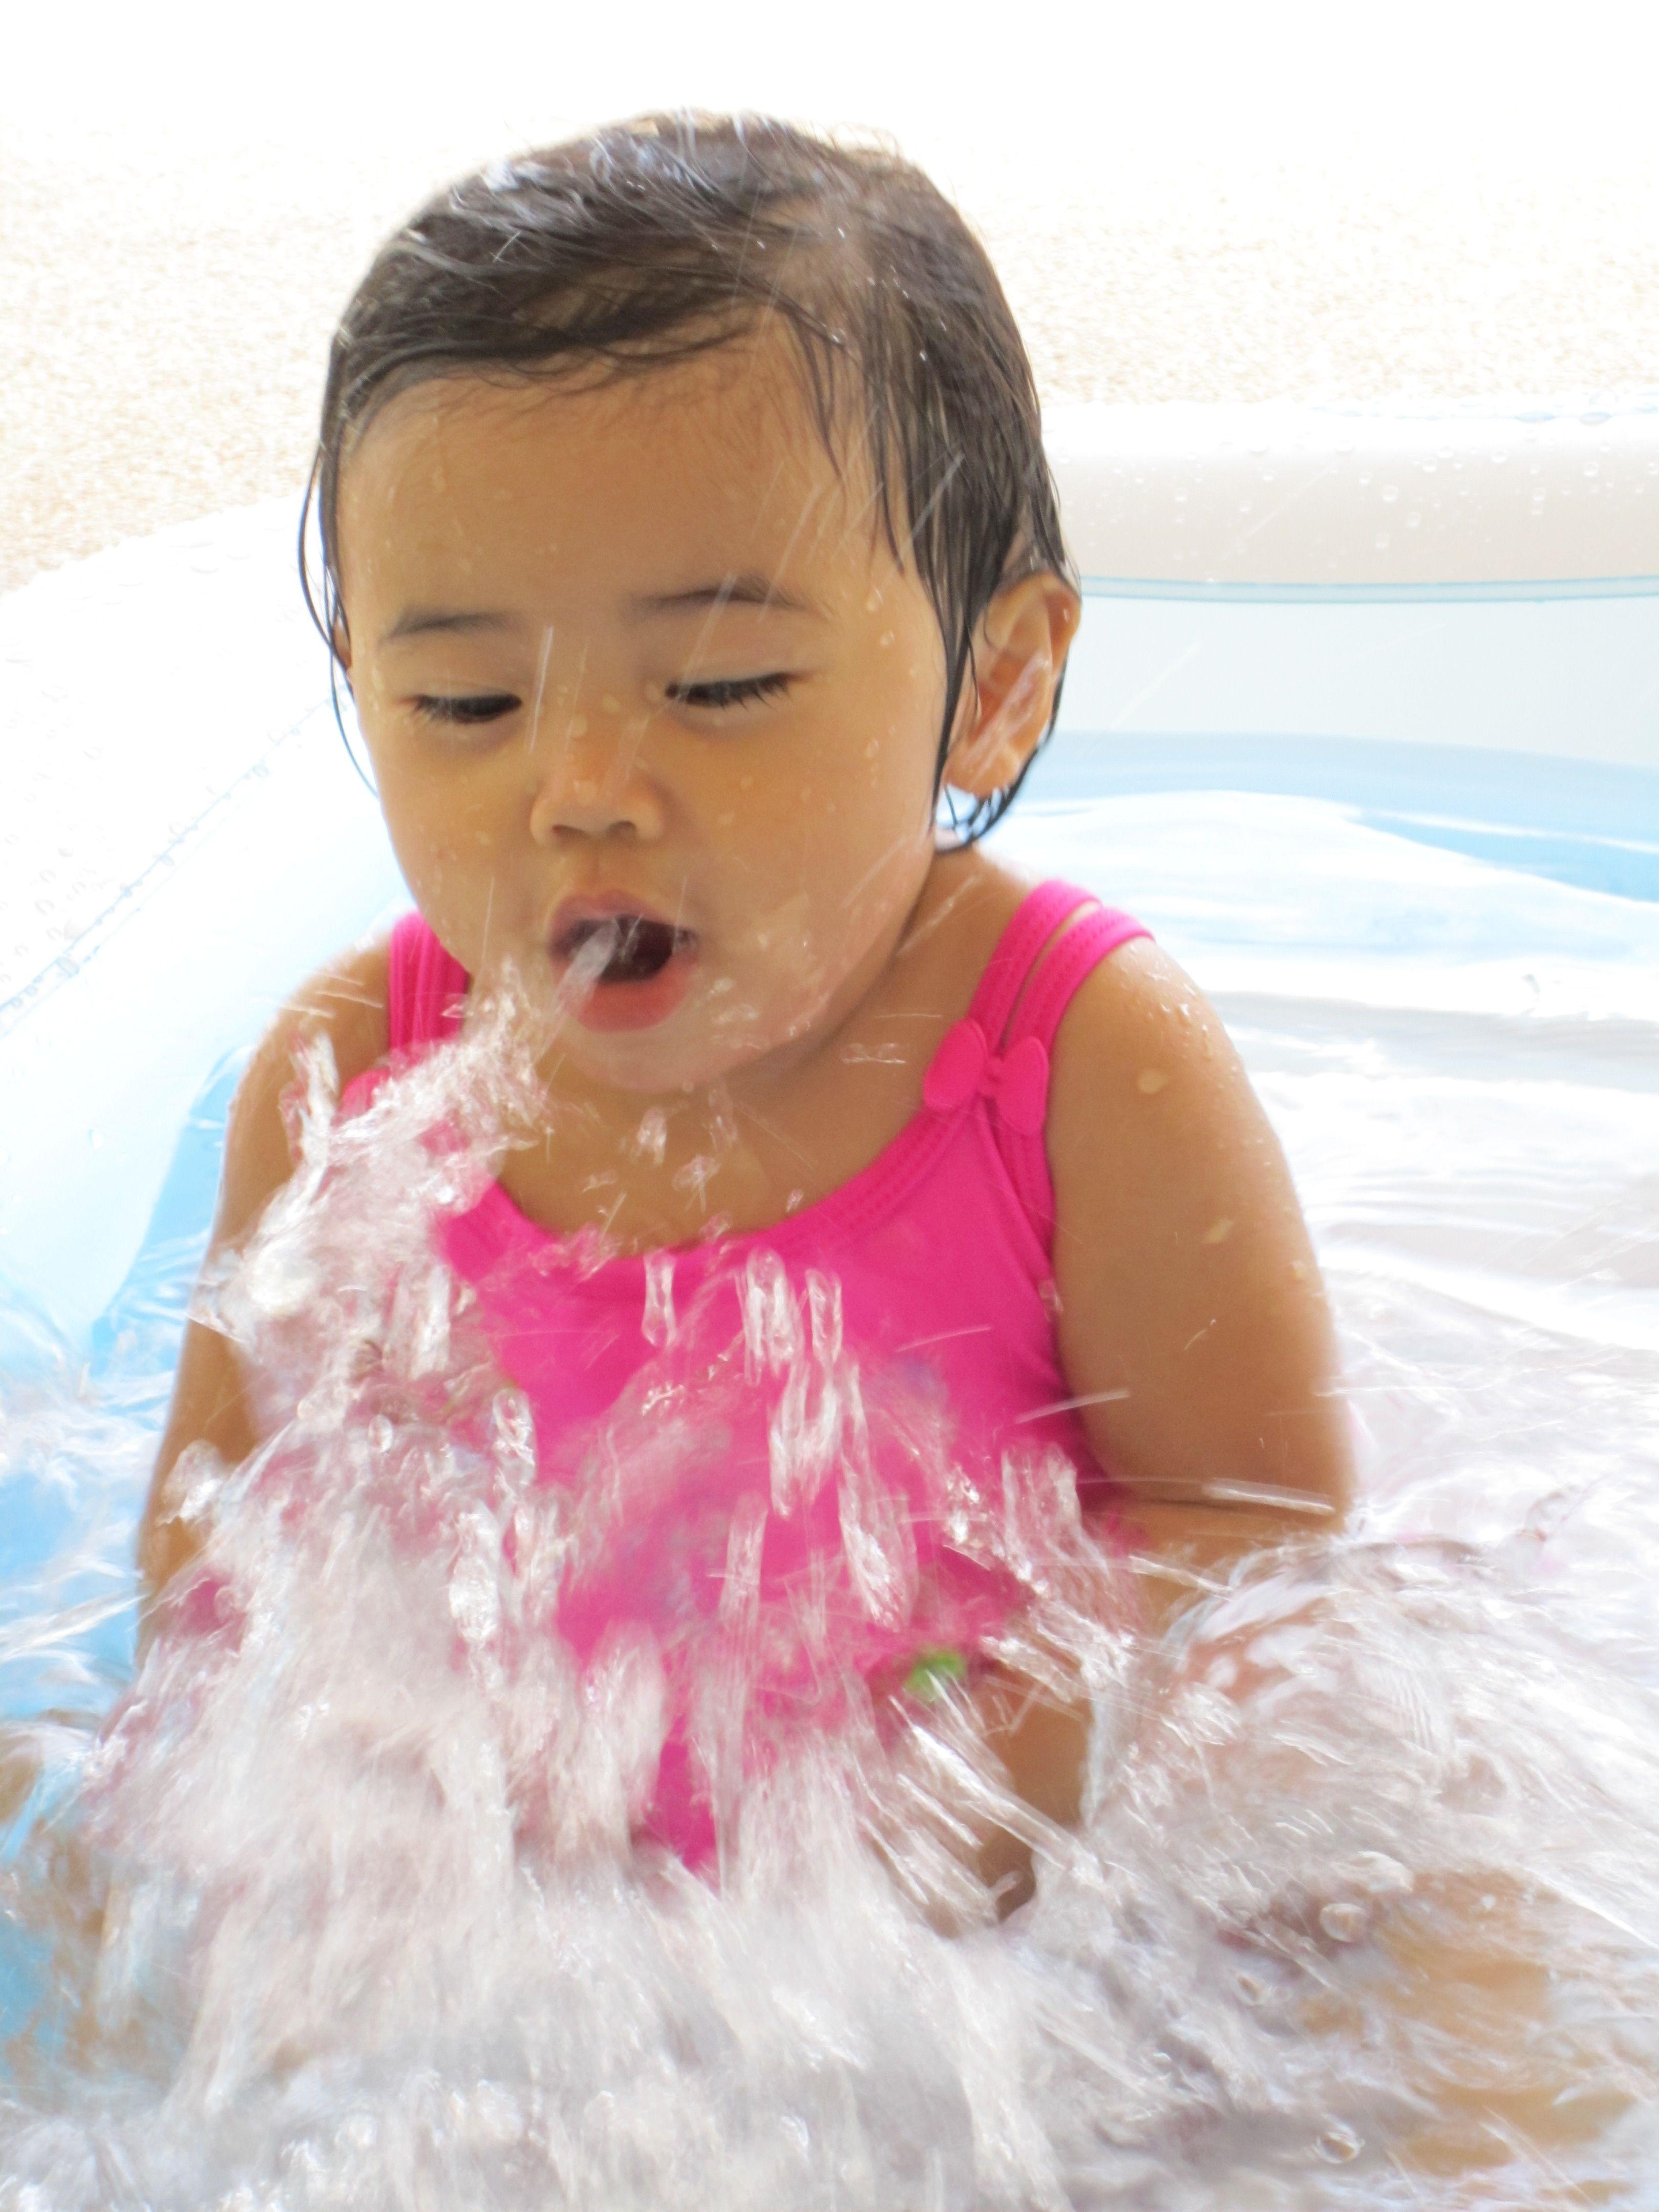 angeliney angeline yu Loving the water - Anikas First Swim